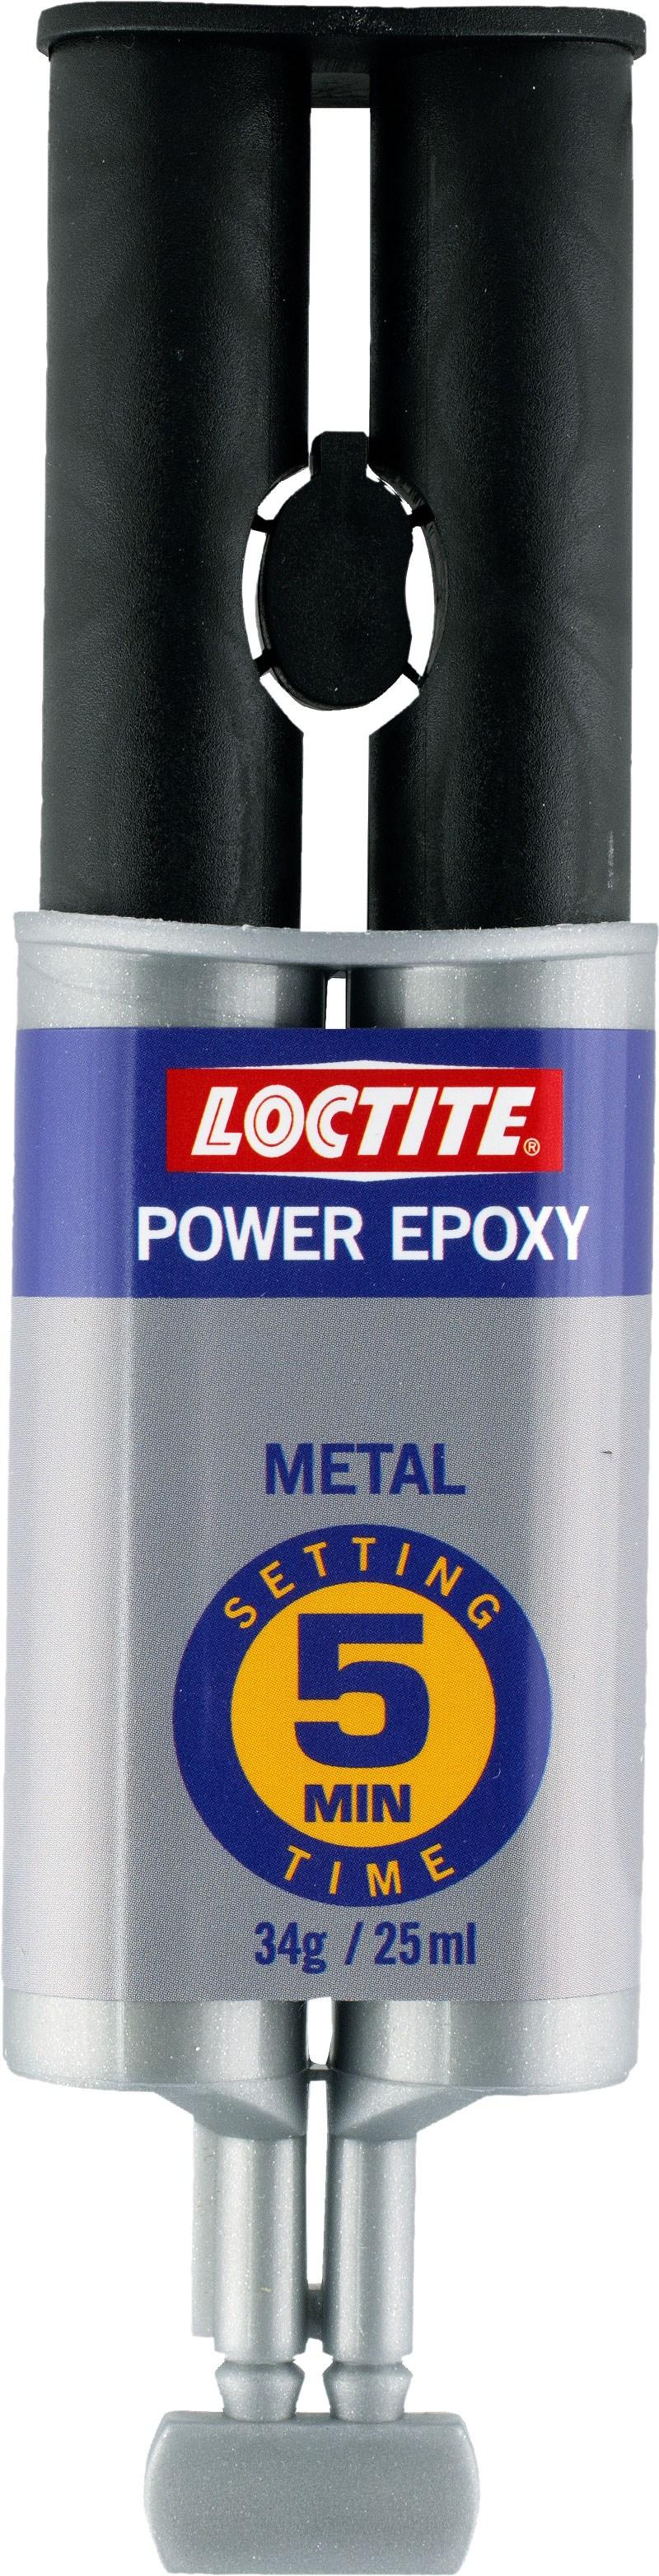 Loctite Superstål/Power Epoxi Metal